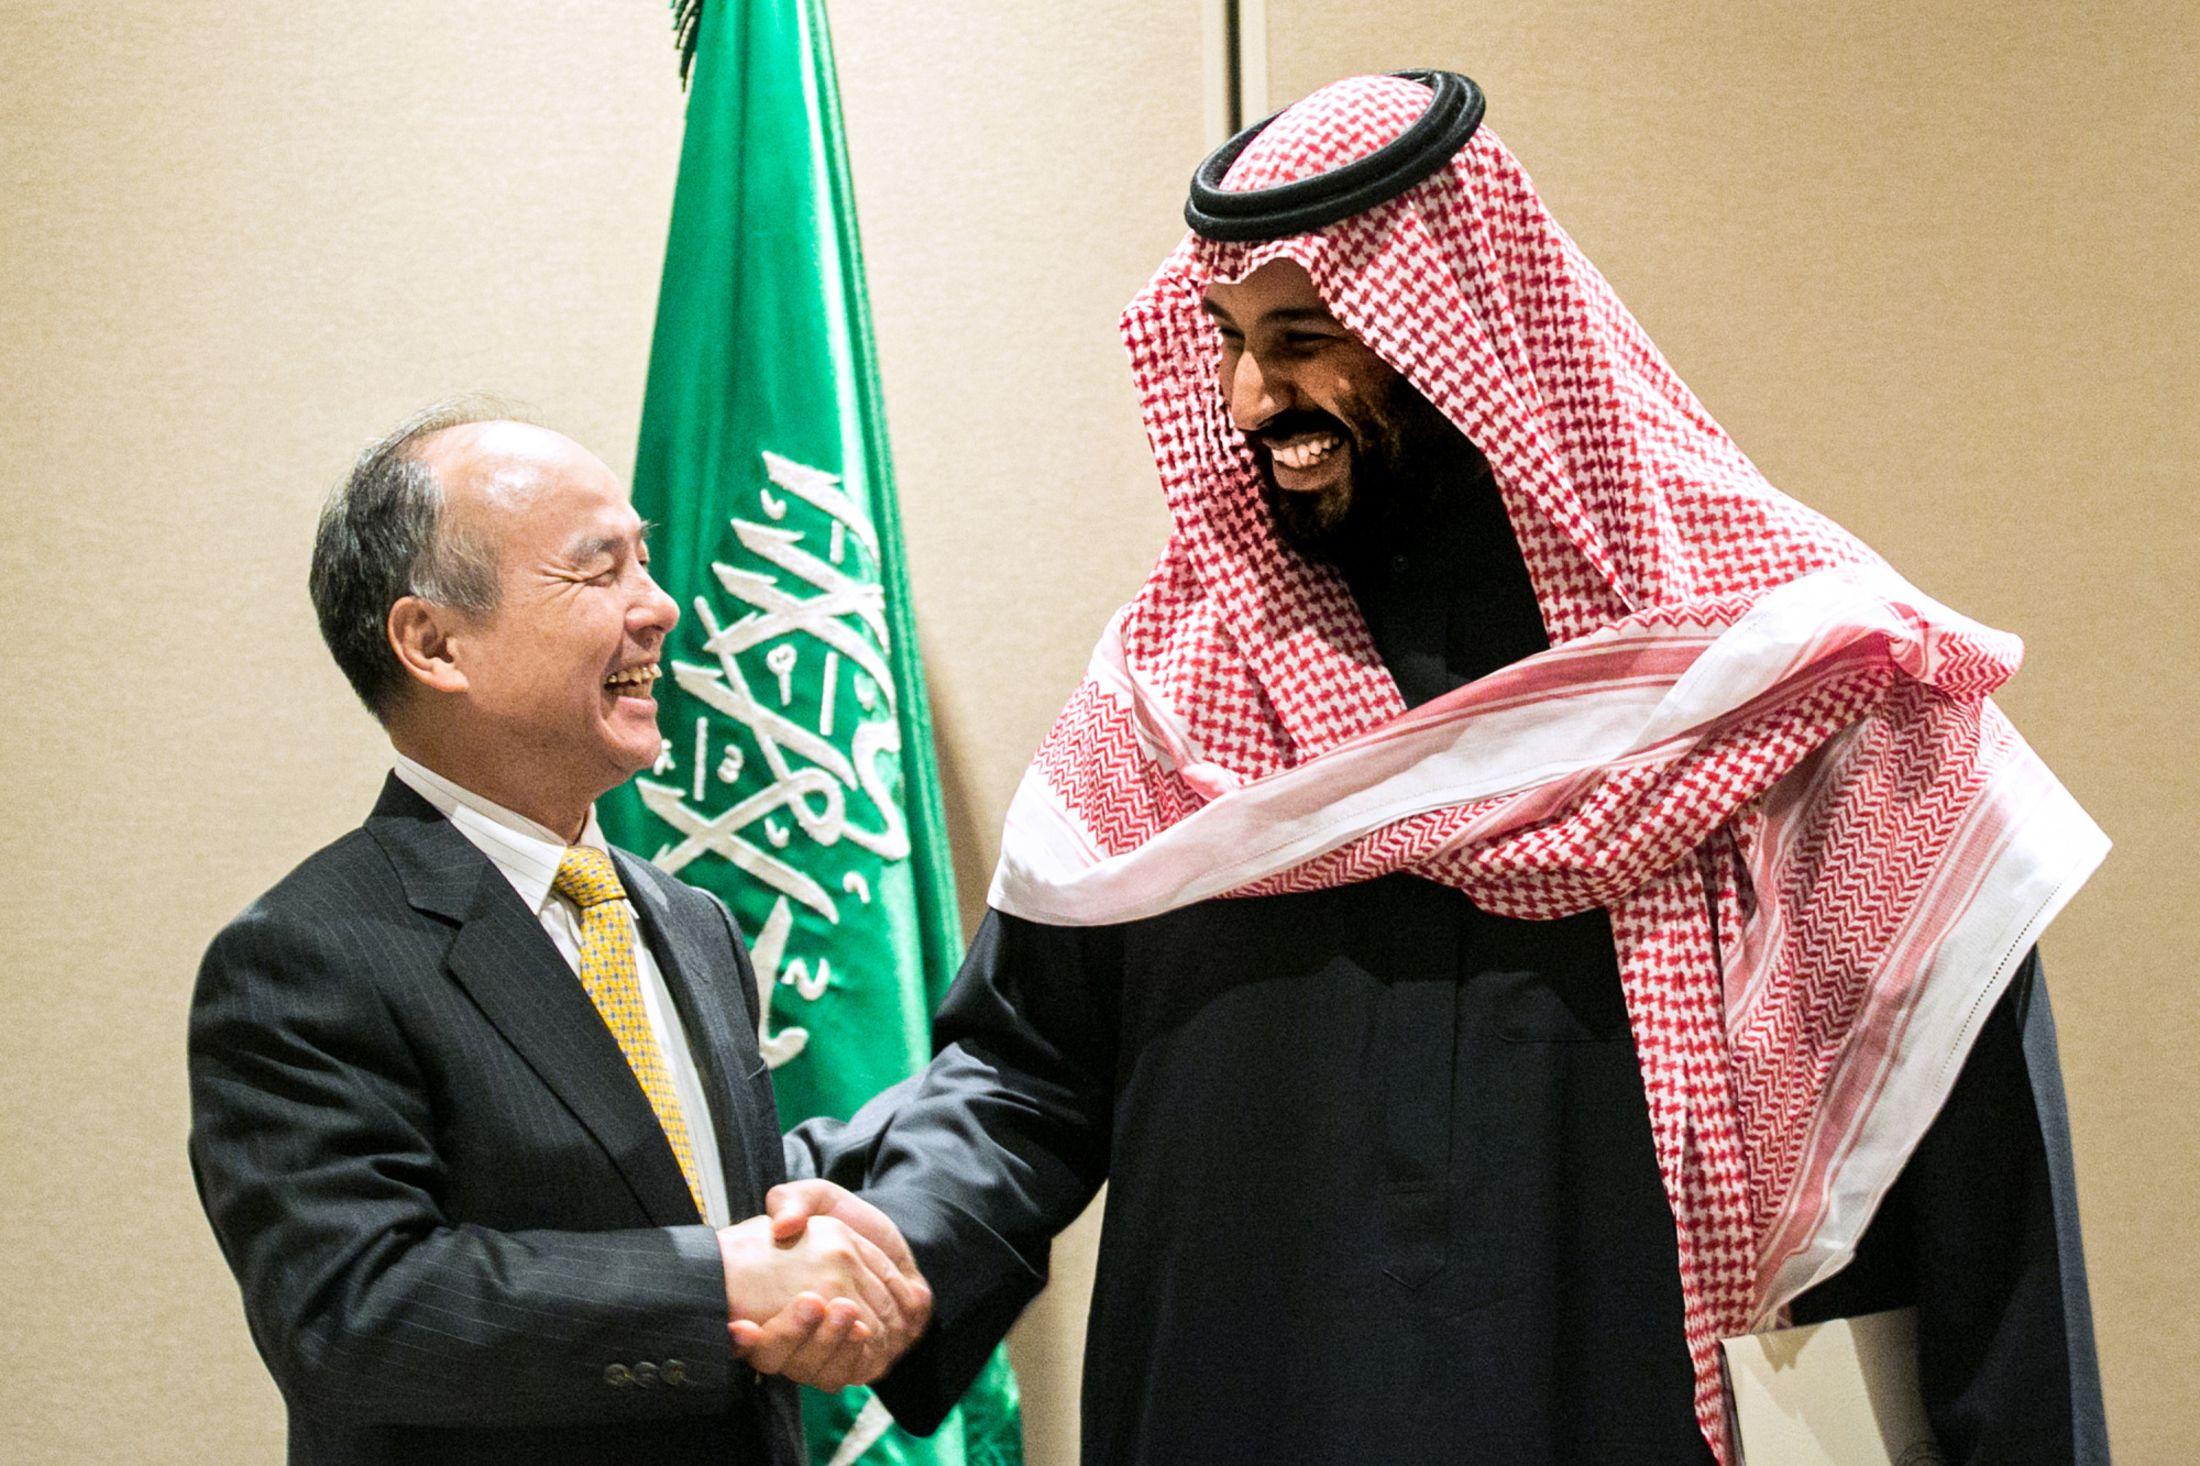 Saudi Arabia Doubles Down on SoftBank Bet With Extra $45 Billion